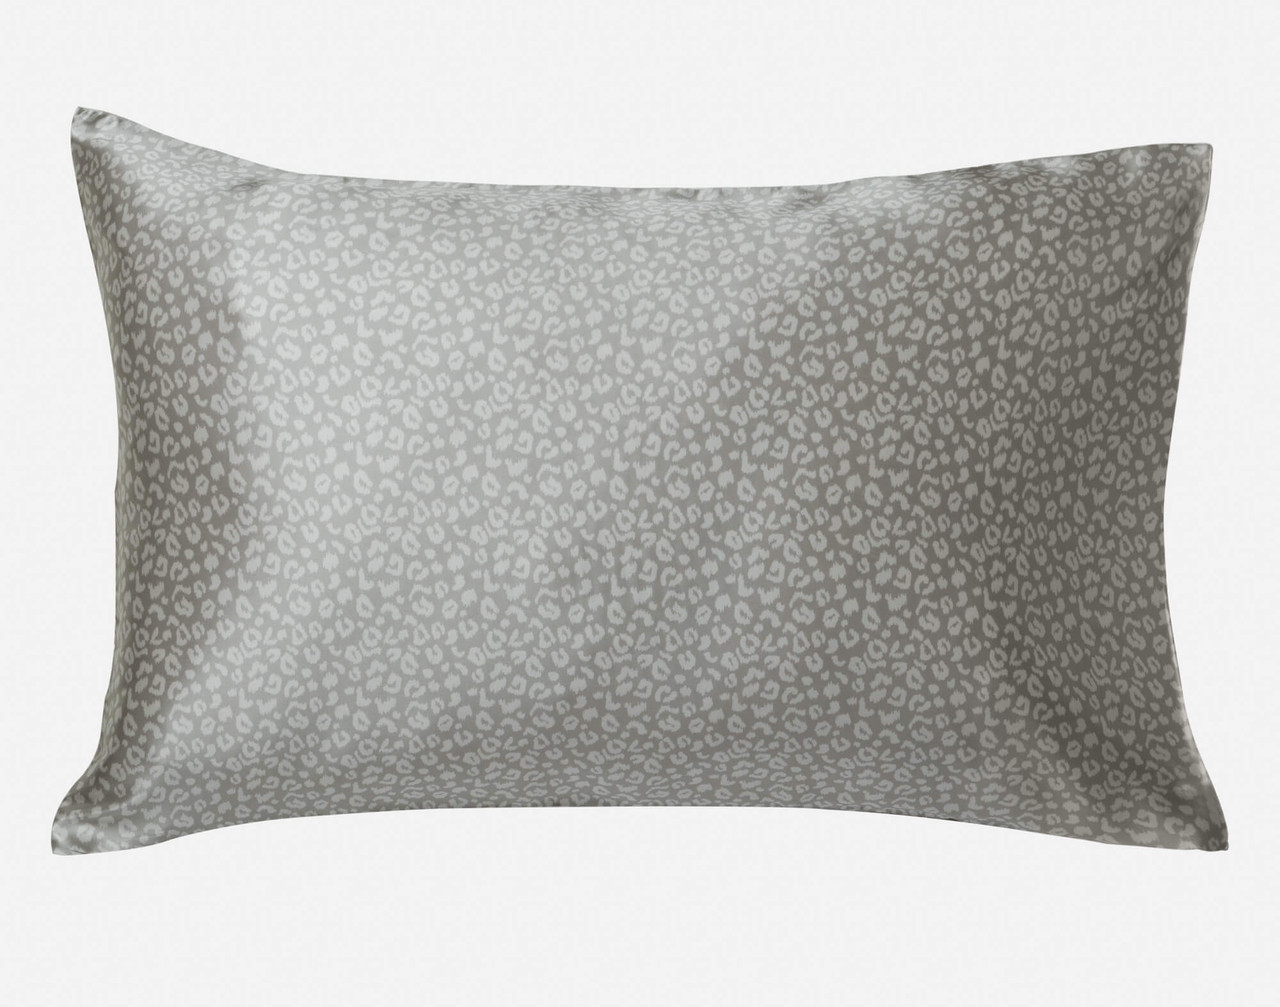 100% Mulberry Silk Pillowcase in Silver Leopard.